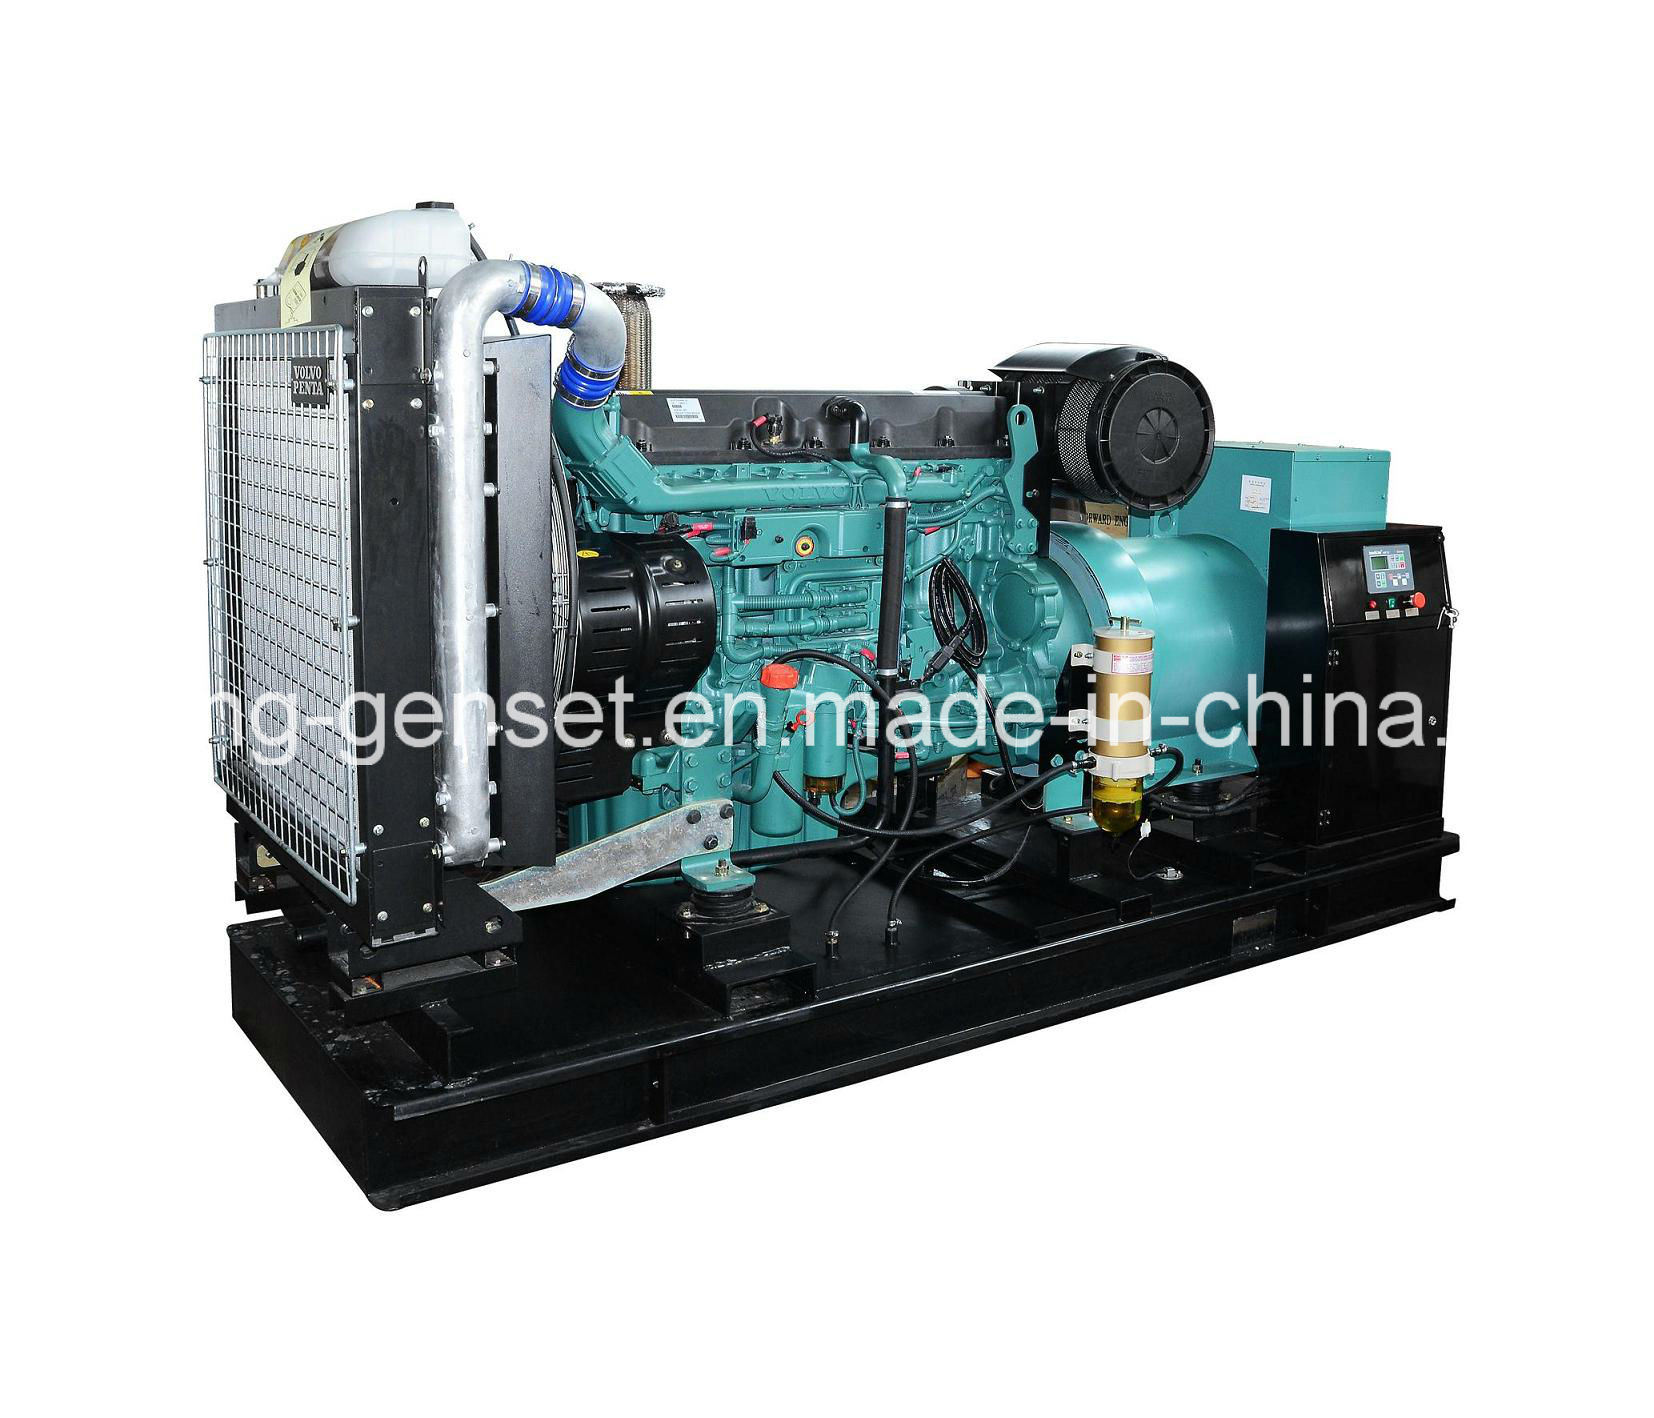 75kVA-687.5kVA Diesel Open Generator with Vovol Engine (VK33300)